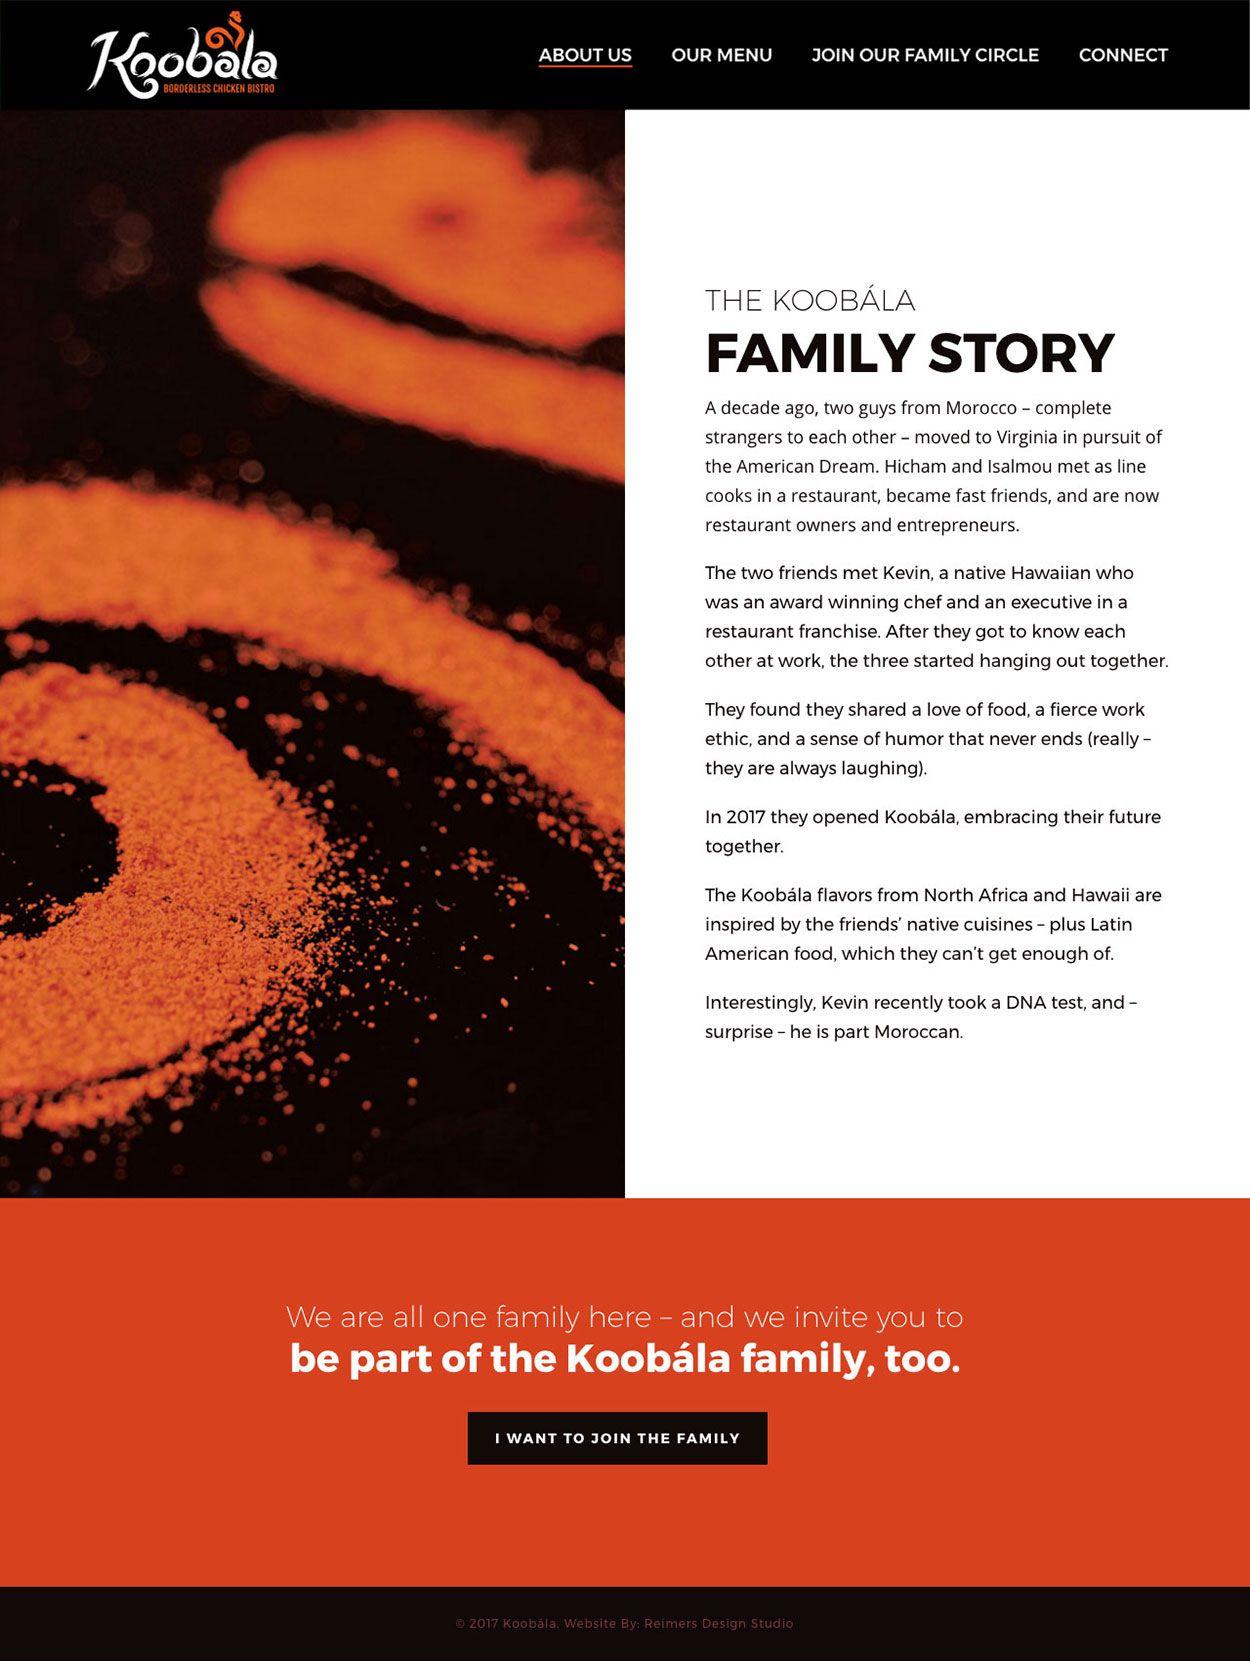 Koobala Family Story